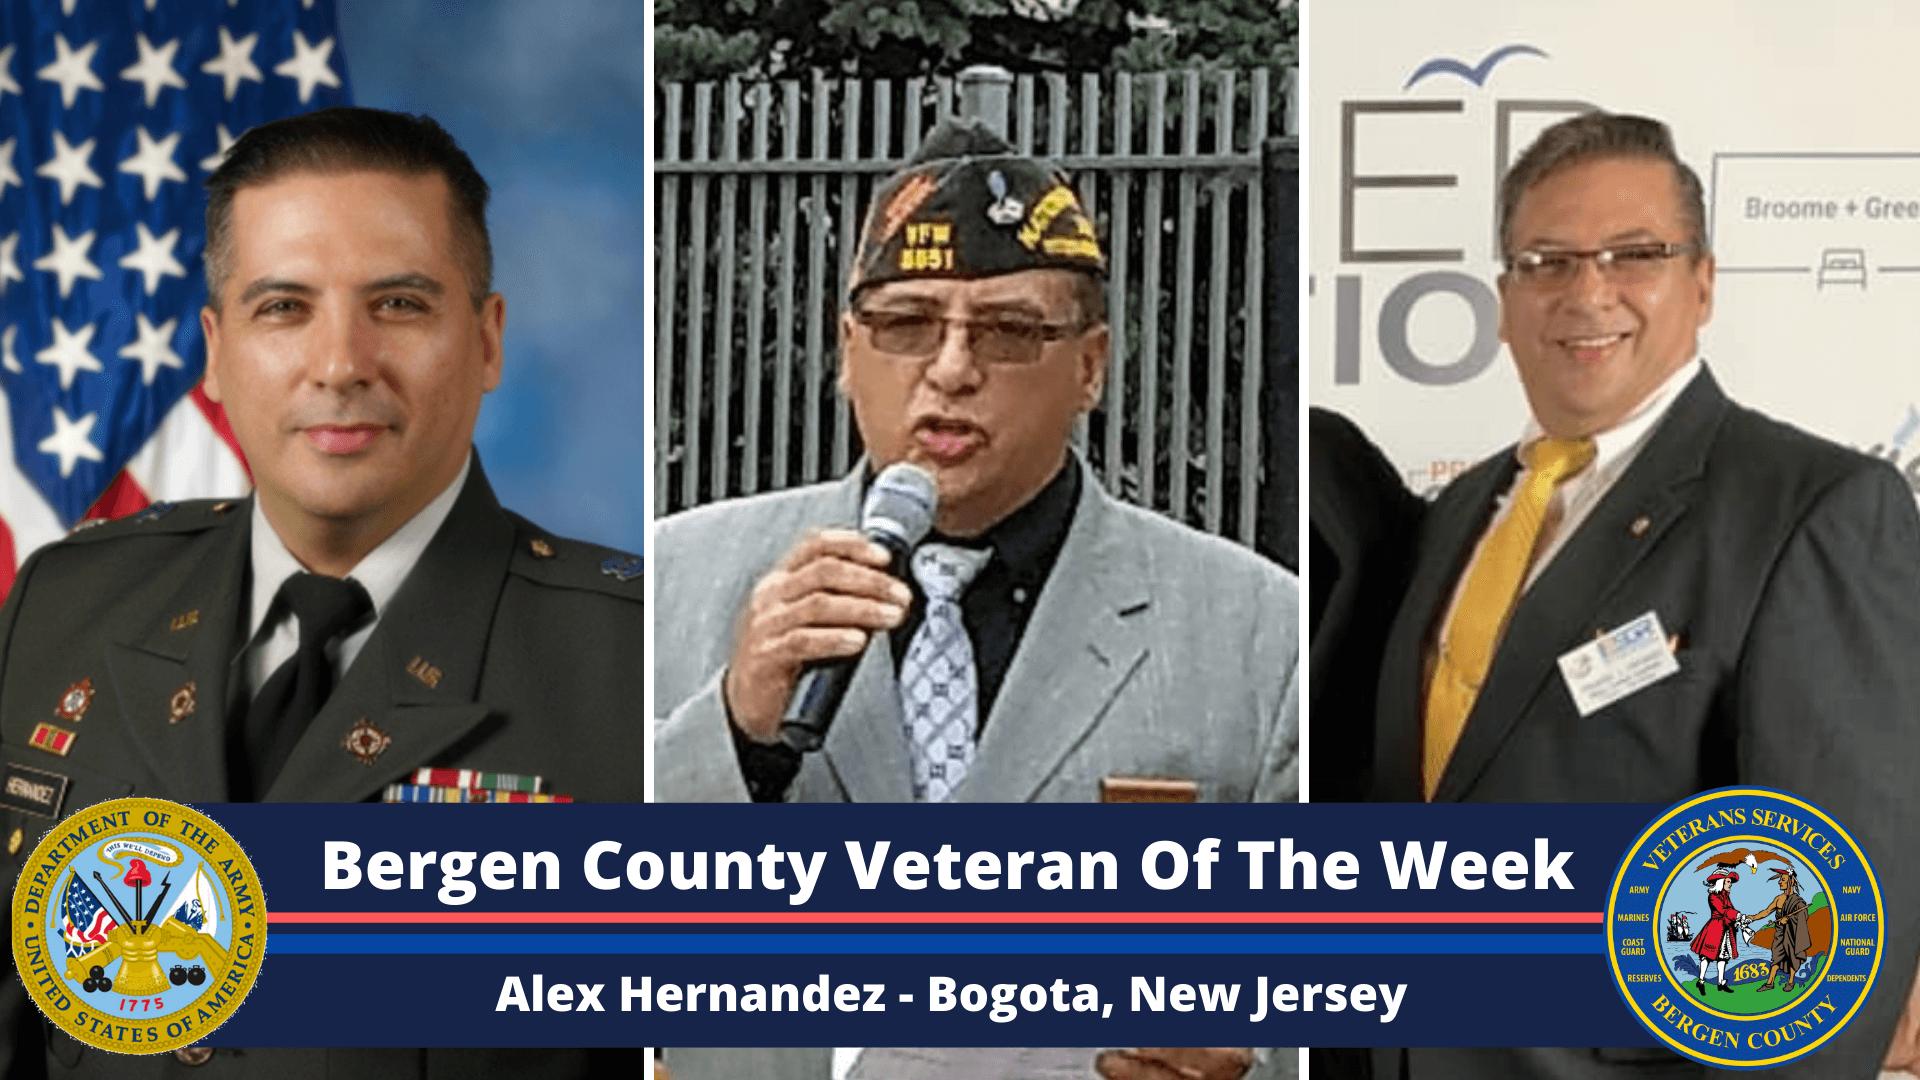 Bergen County Veteran of the Week: Alex Hernandez